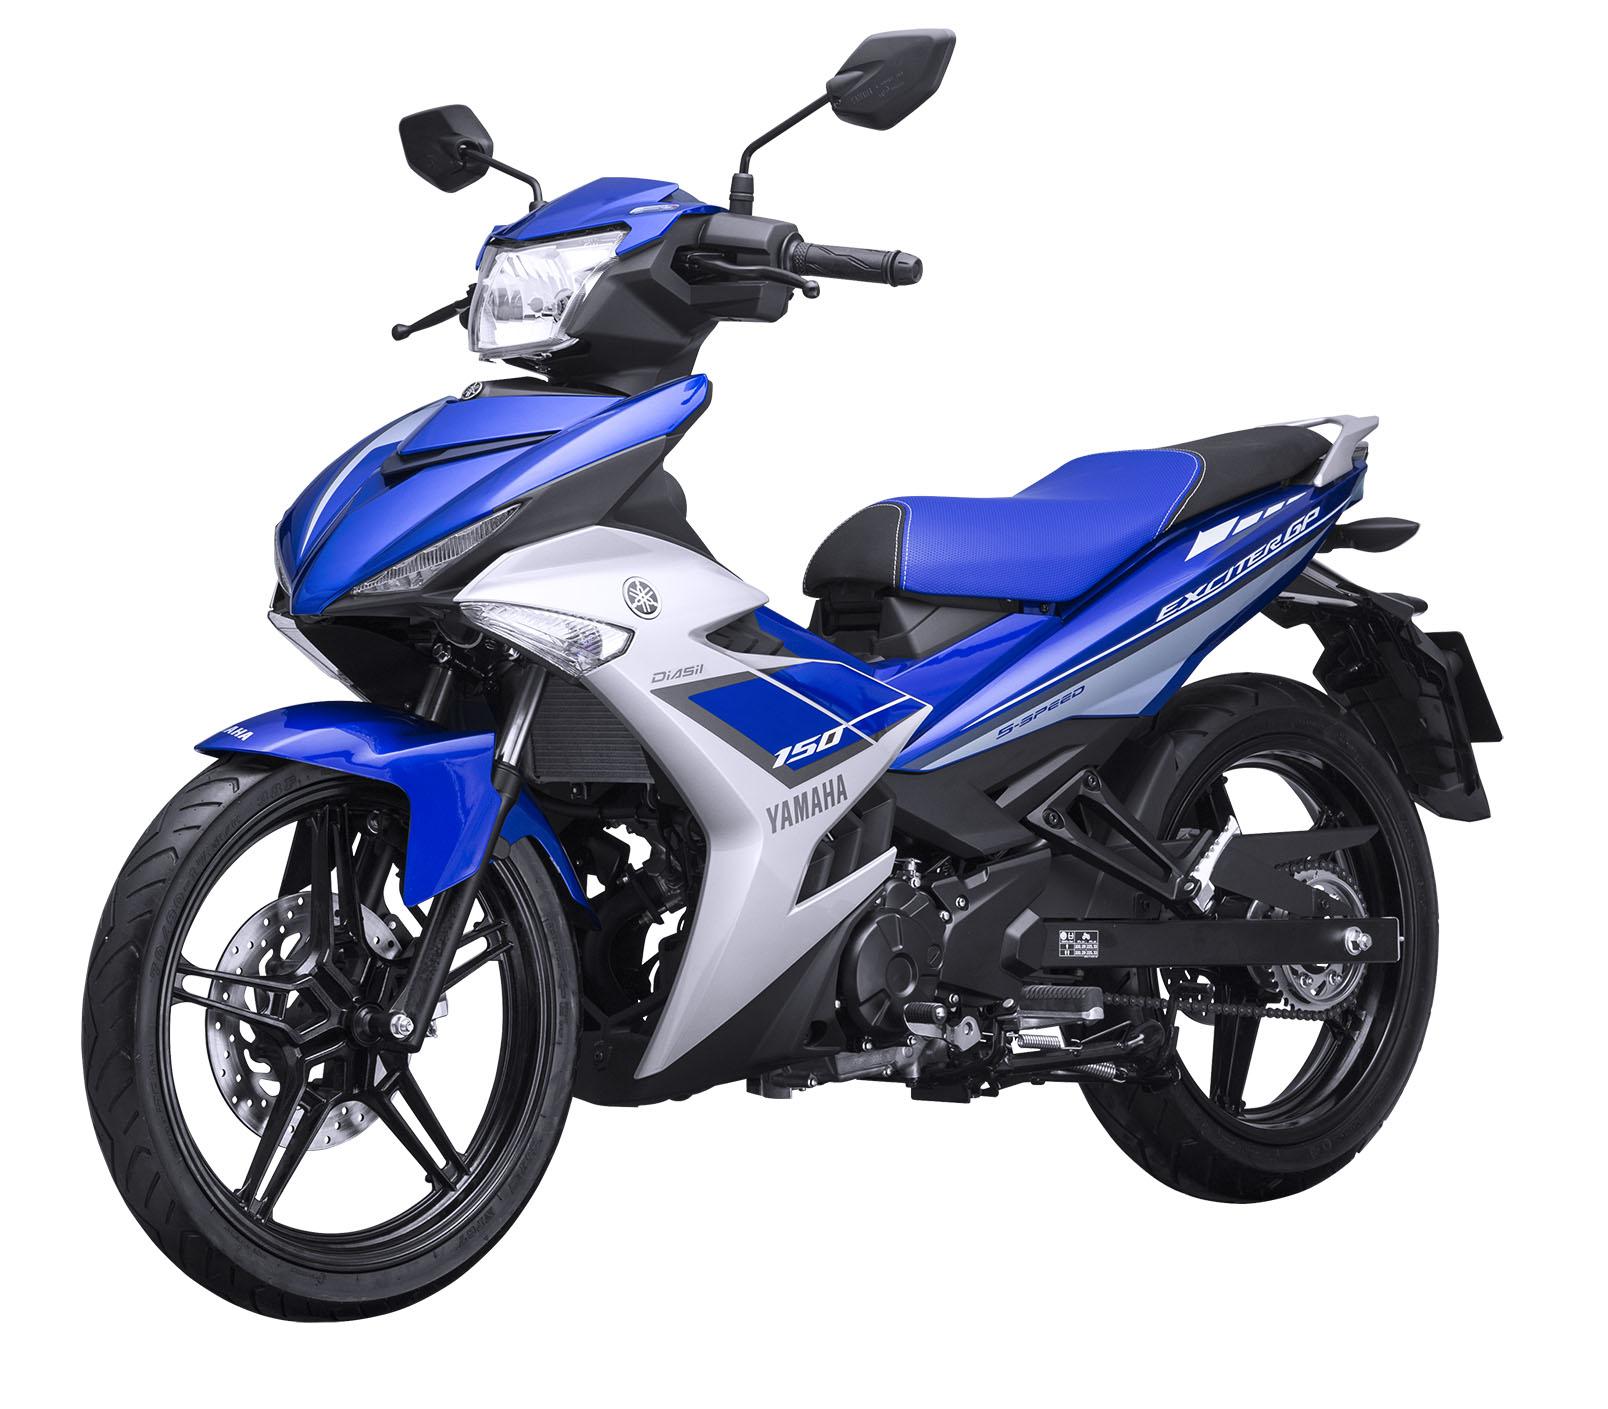 Kumpulan Gambar Sepeda Motor Mx King Terbaru Dinding Motor